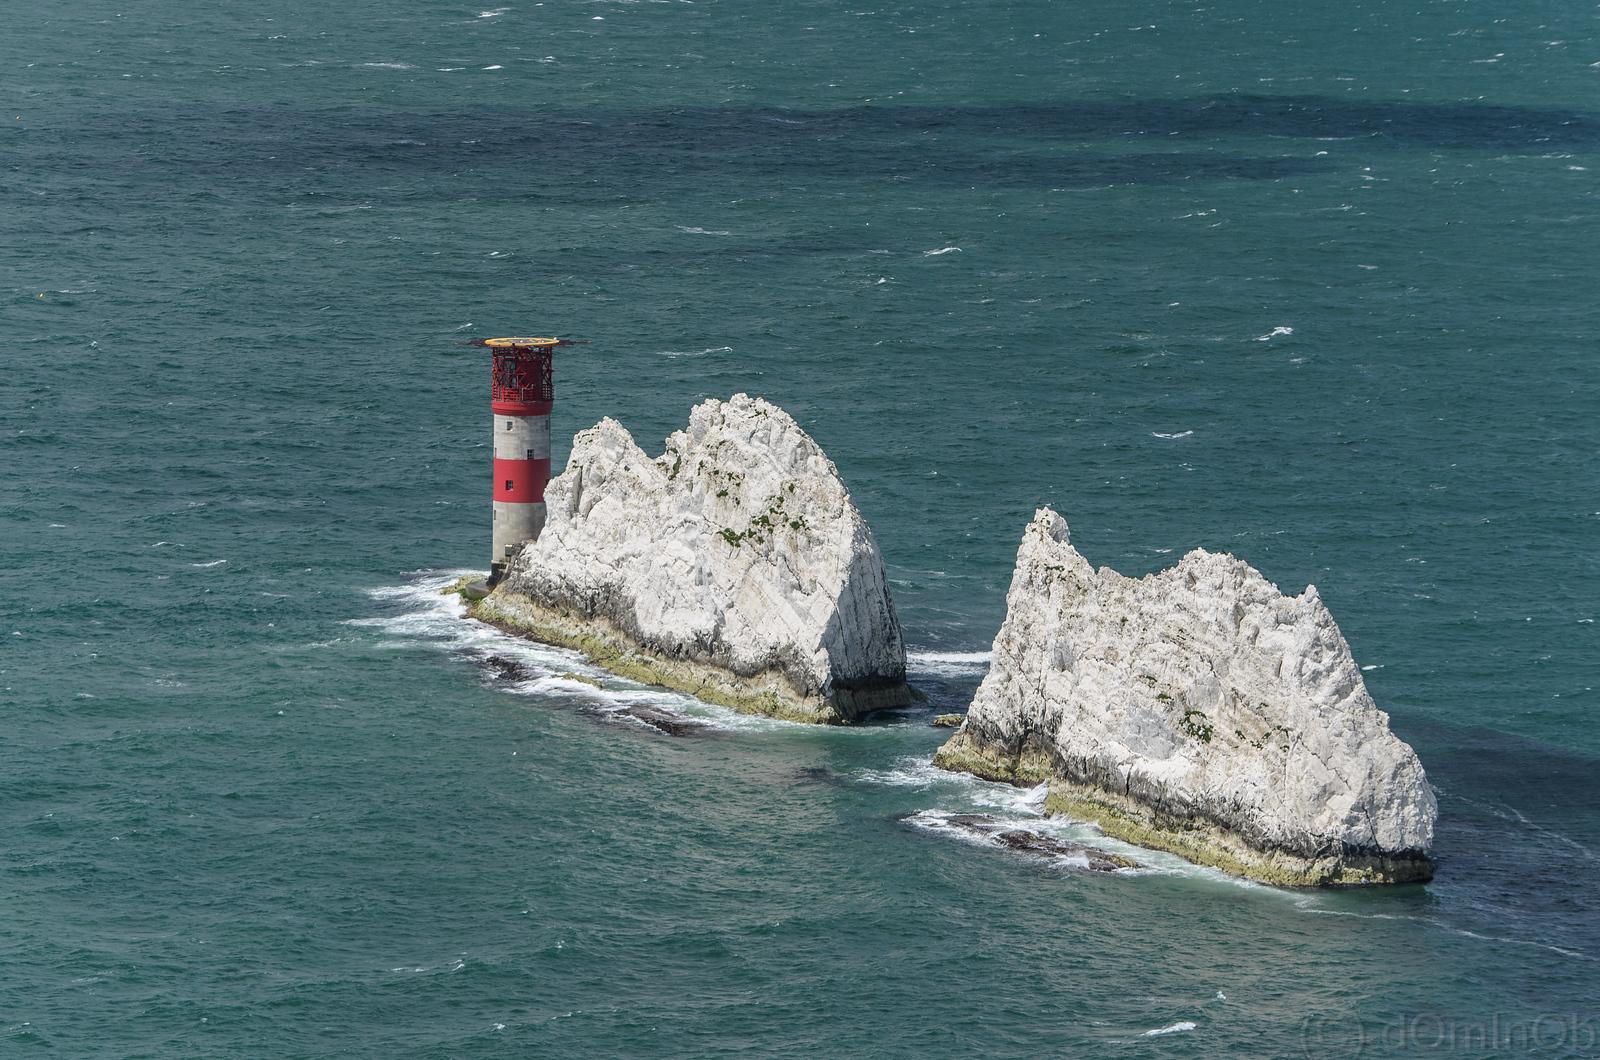 2012 - Isle of Wight